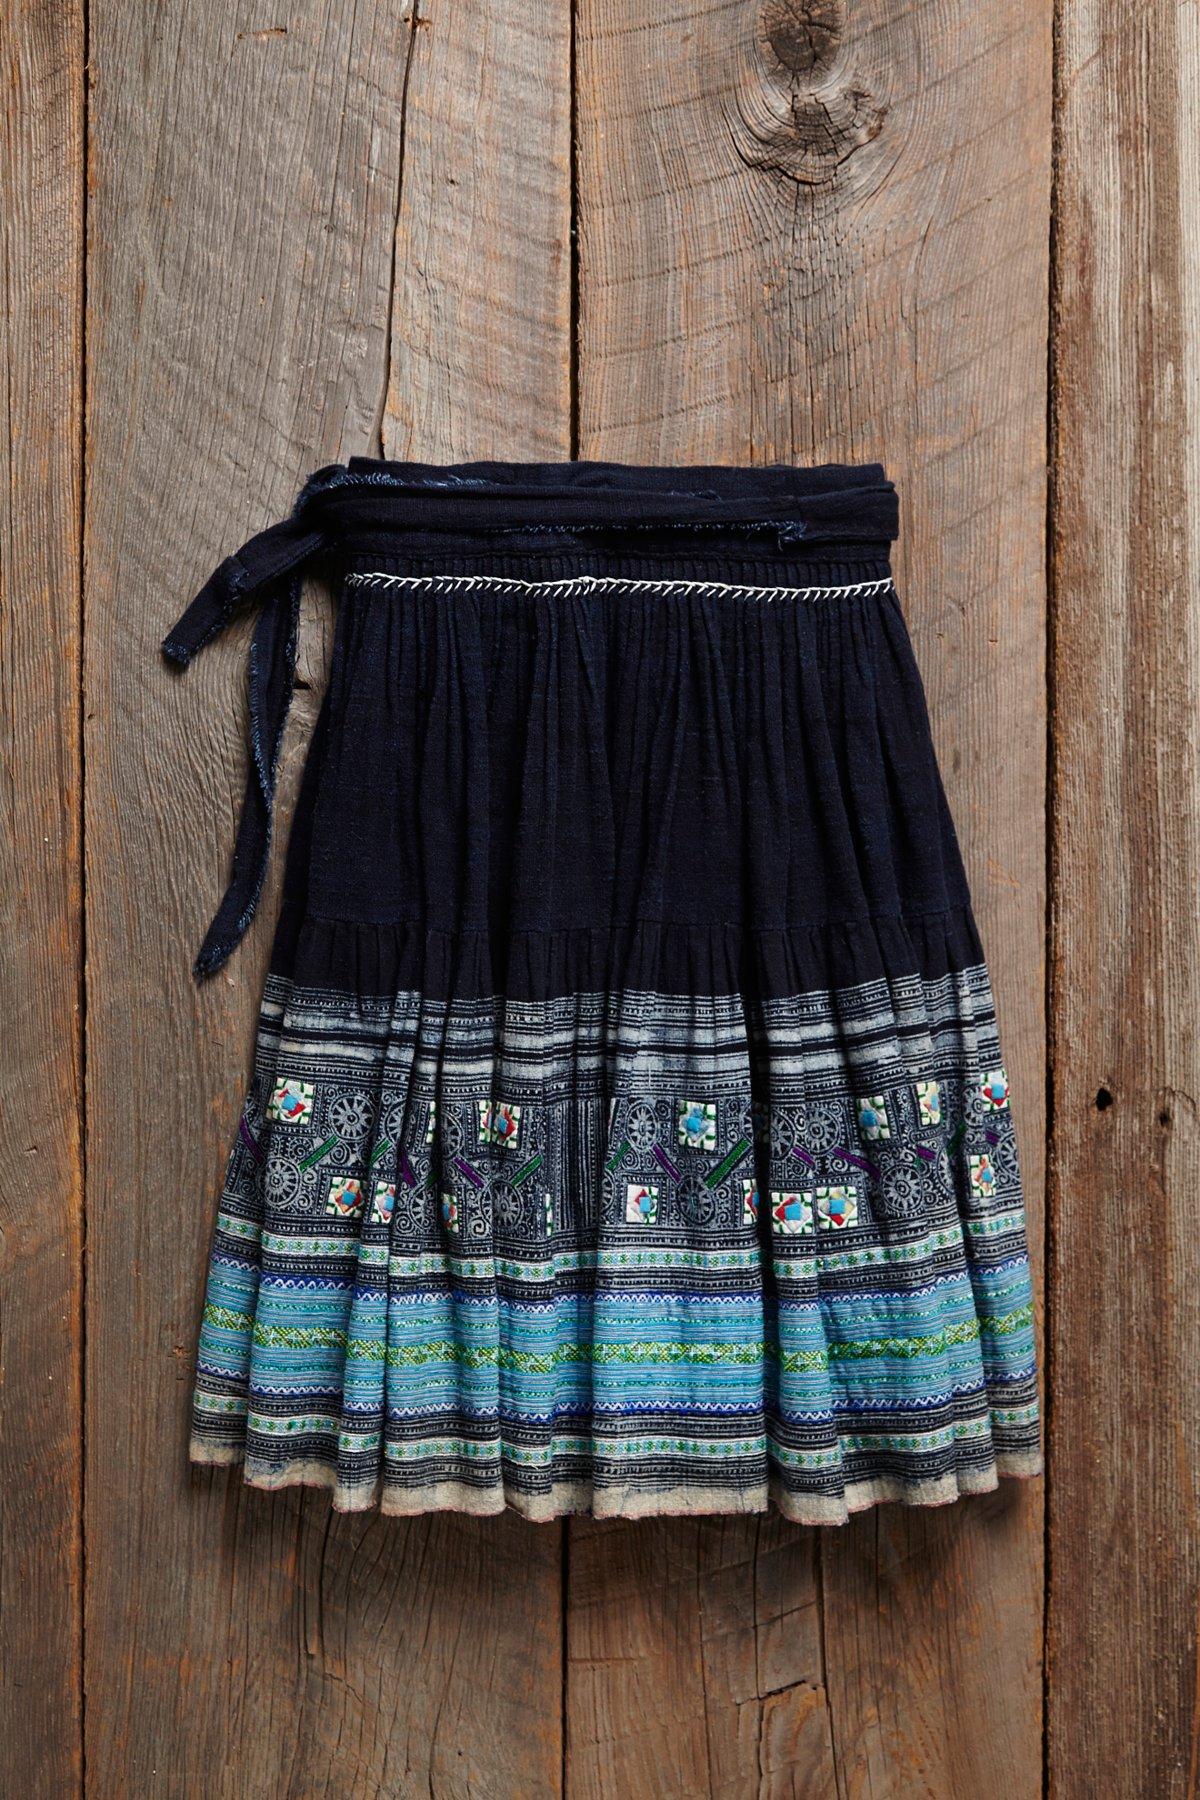 Vintage Turquoise Embroidered Skirt